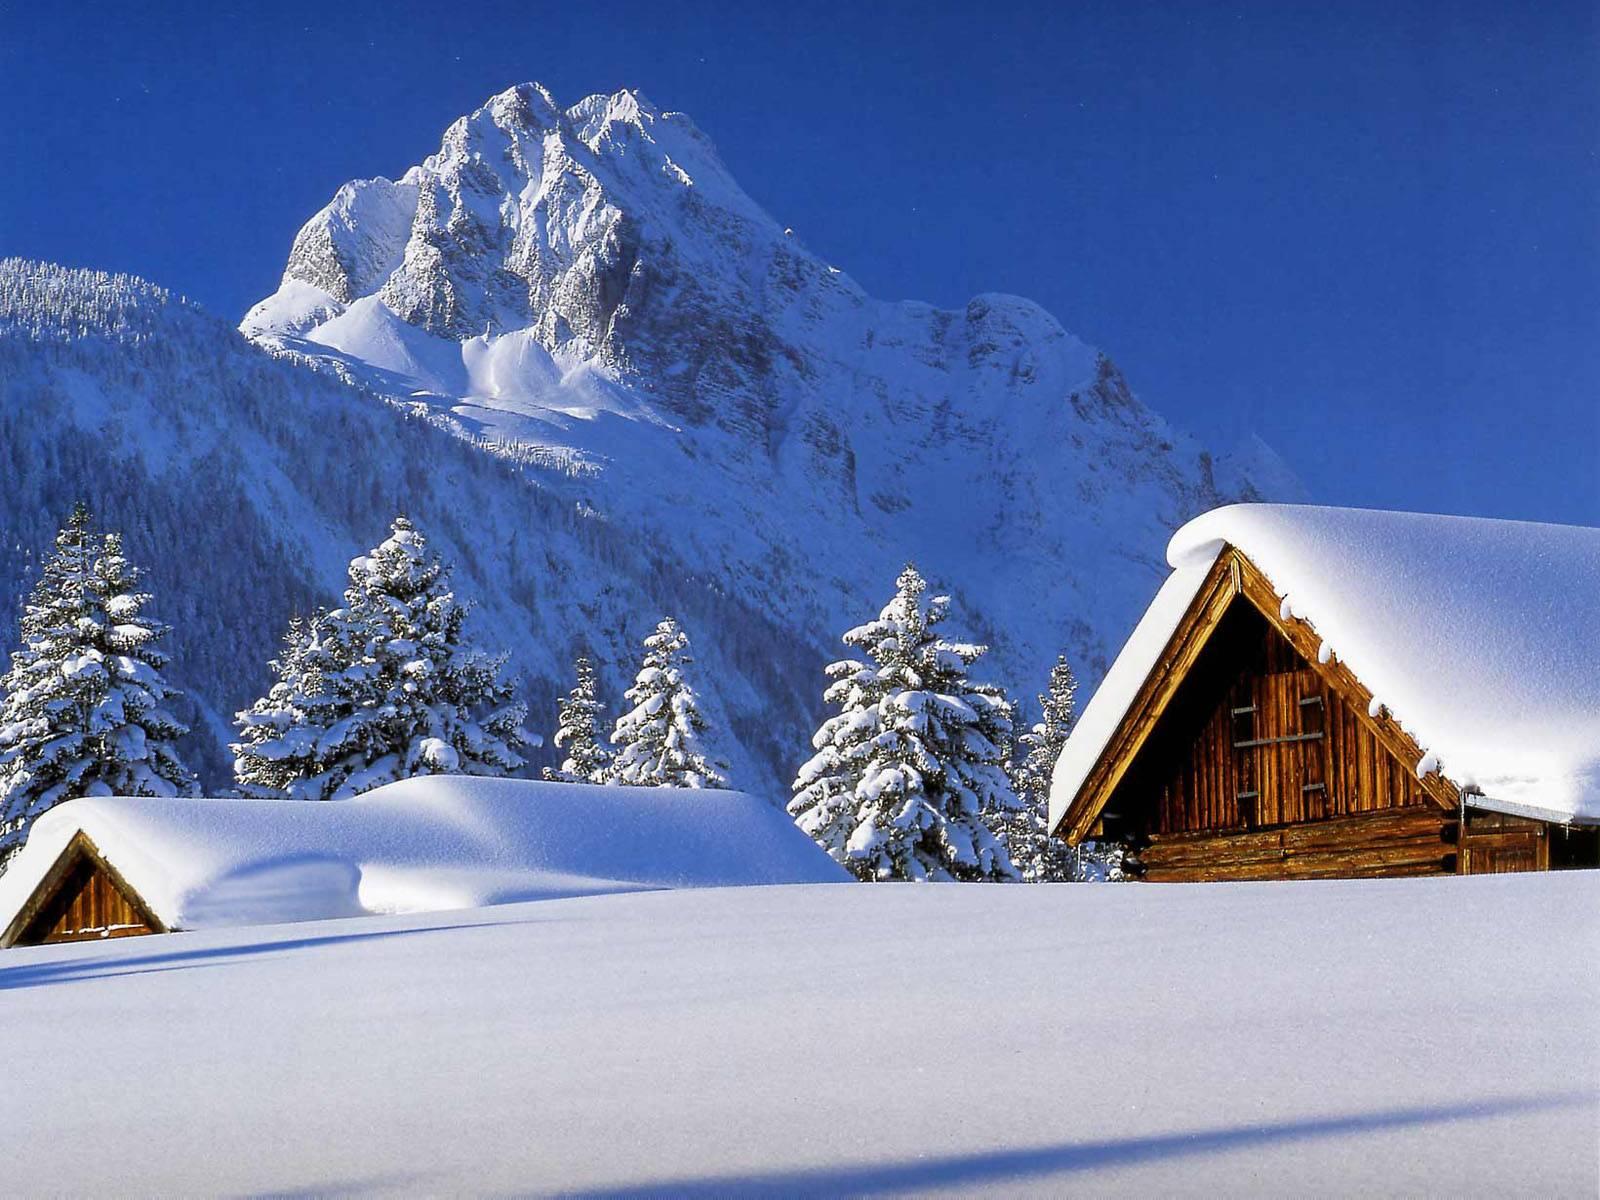 winter scenes desktop backgrounds   SF Wallpaper 1600x1200